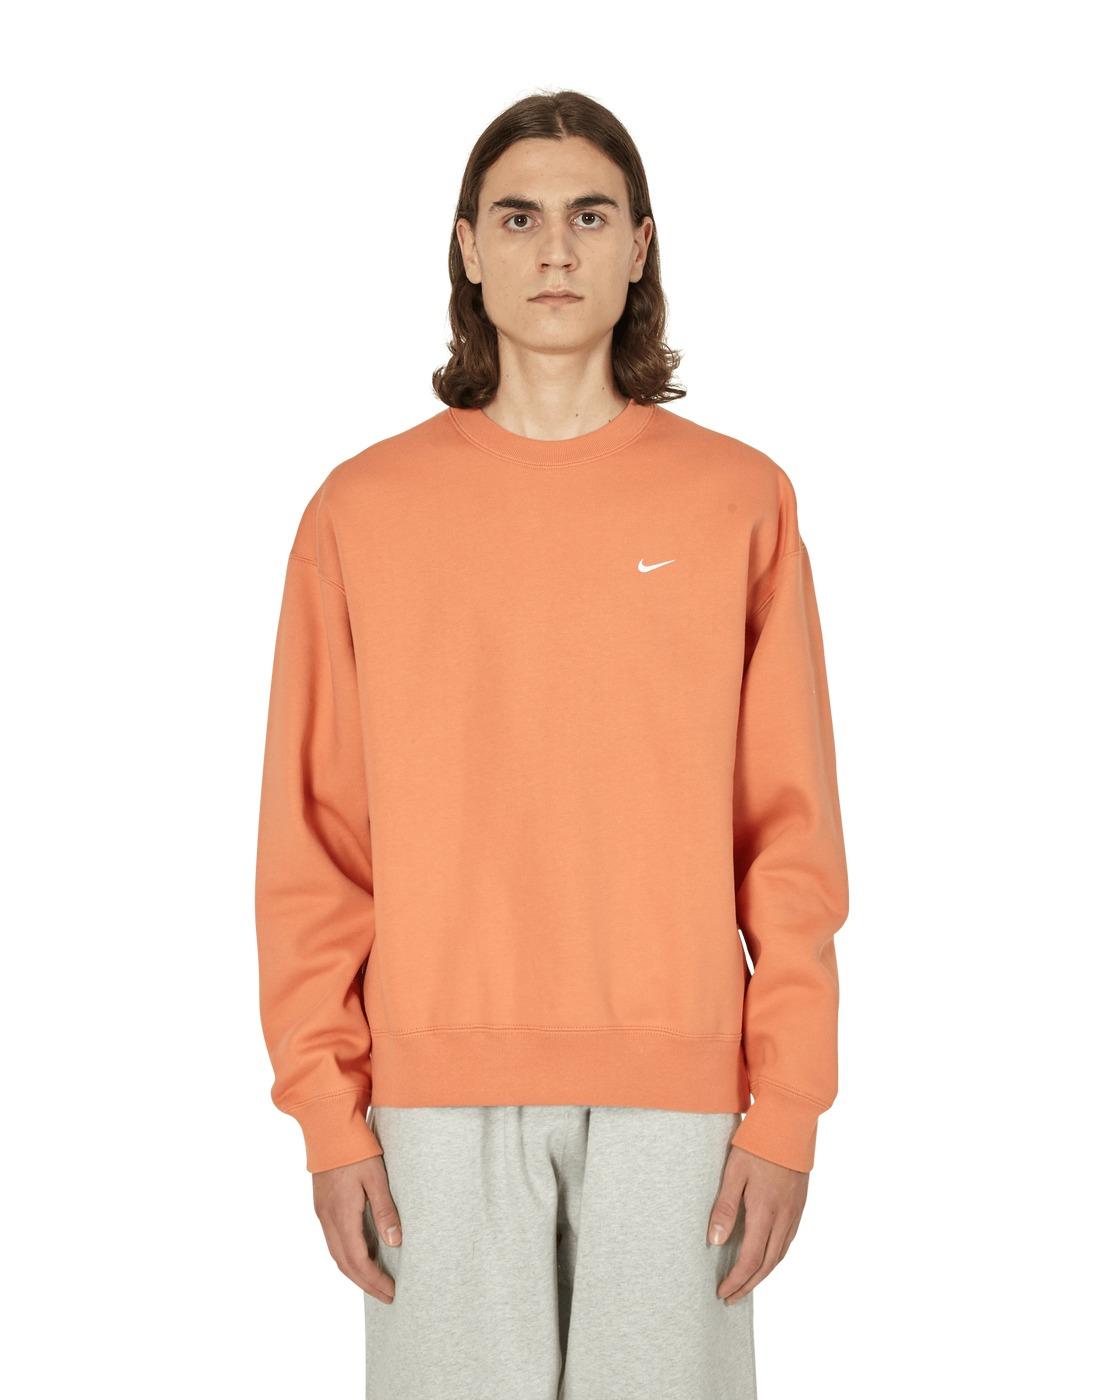 Nike Special Project Crewneck Sweatshirt Healing Orange